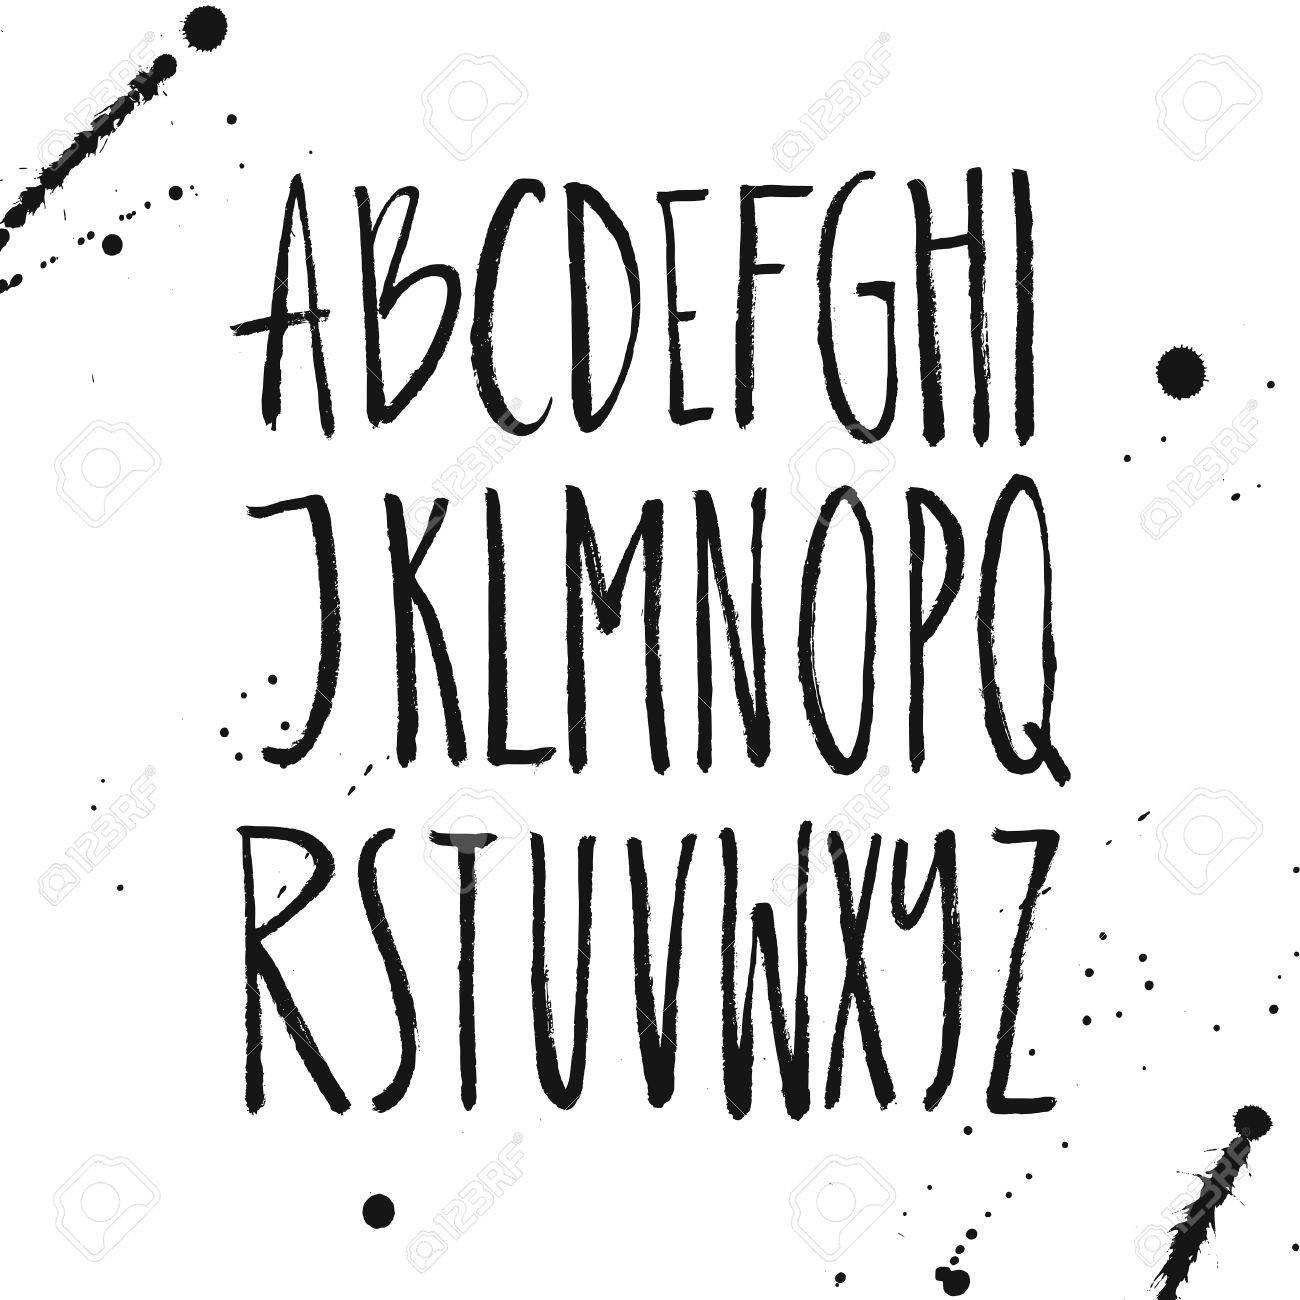 Rustic Font Unique Handdrawn Alphabet Latin Letters Drawn